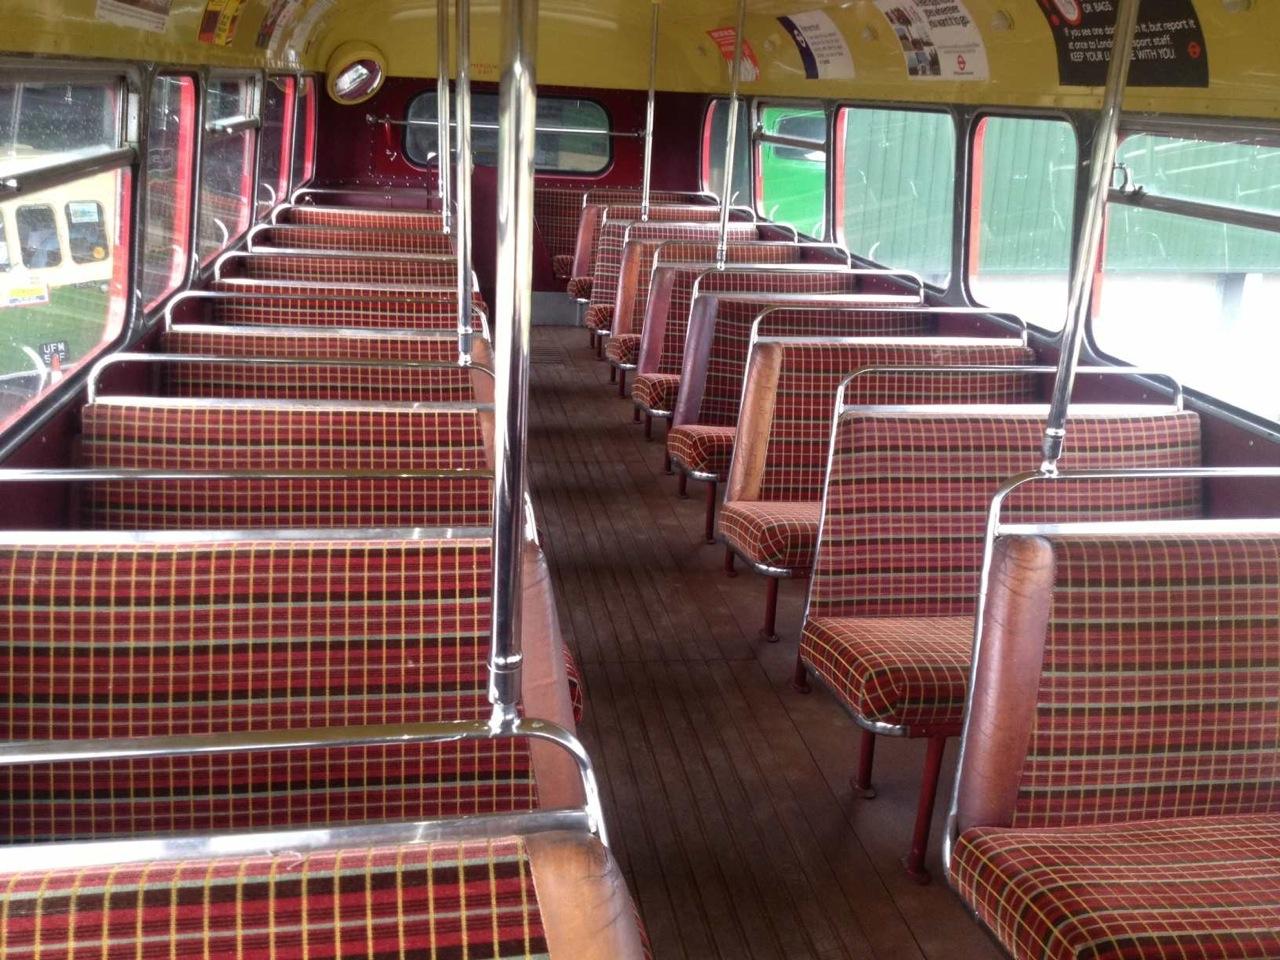 doubledecker londonbus  ダブルデッカー ロンドンバス 新車 中古車 デソート